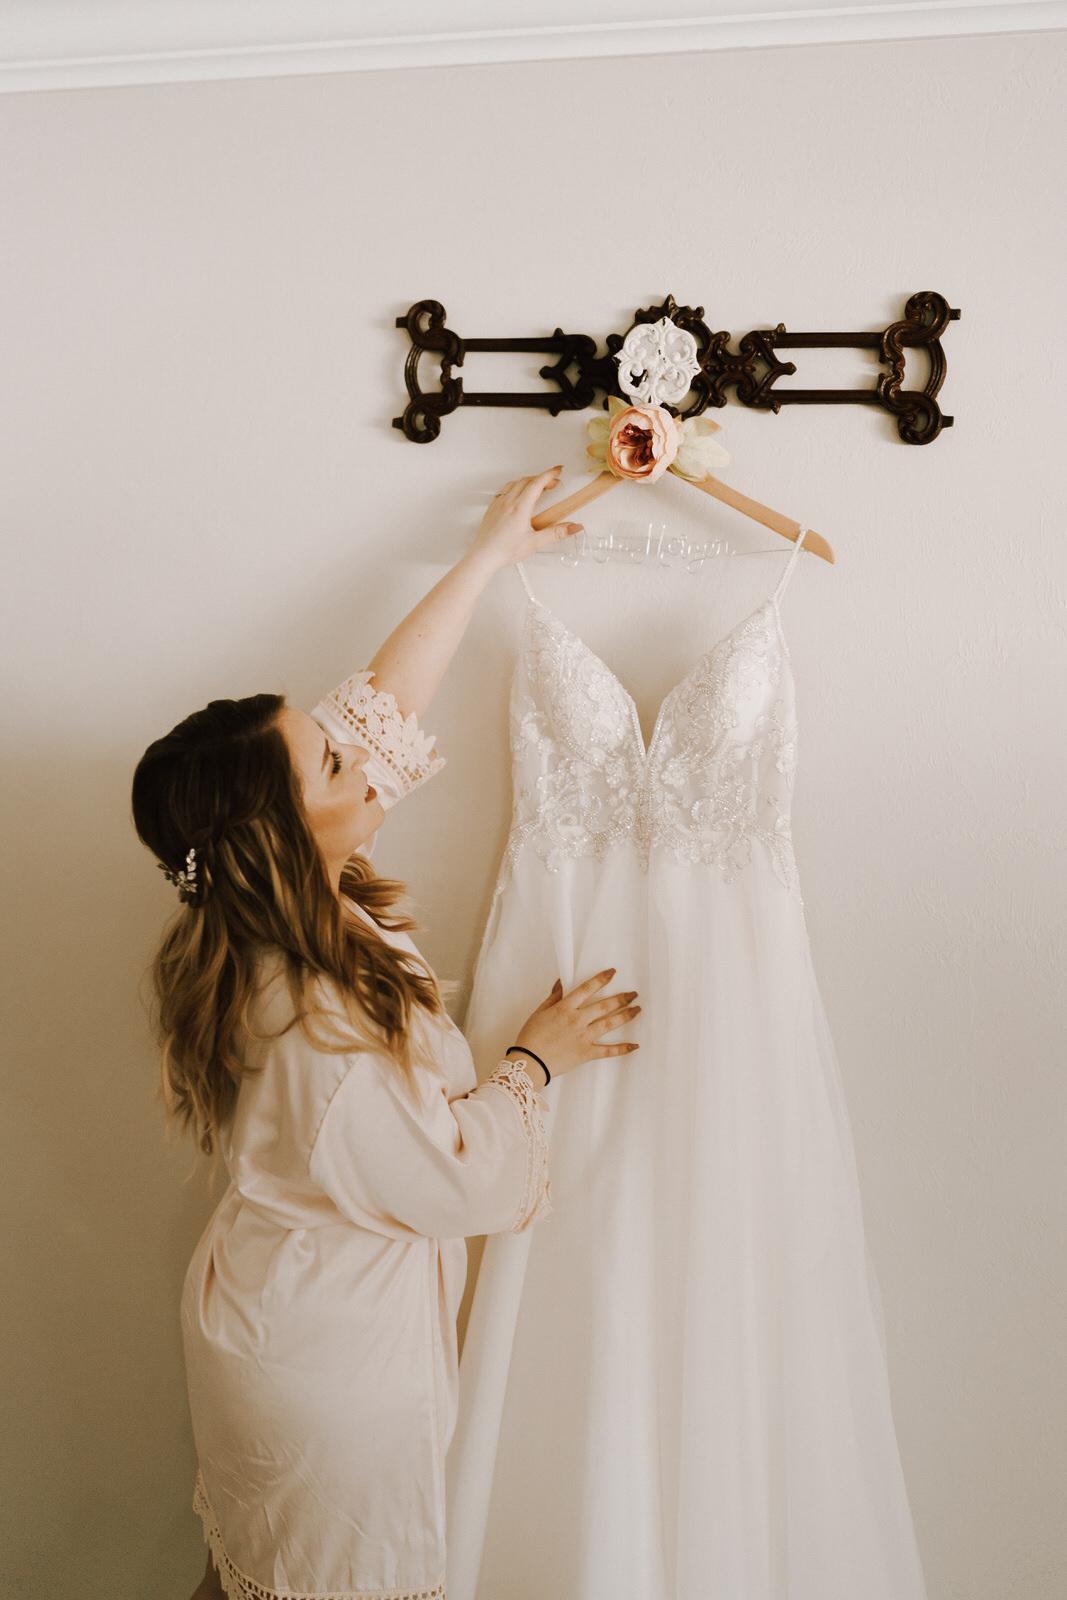 Bayshore Ranch Wedding- Fort Myers Wedding - Michelle Gonzalez Photography - Anais and Damien-80.jpg